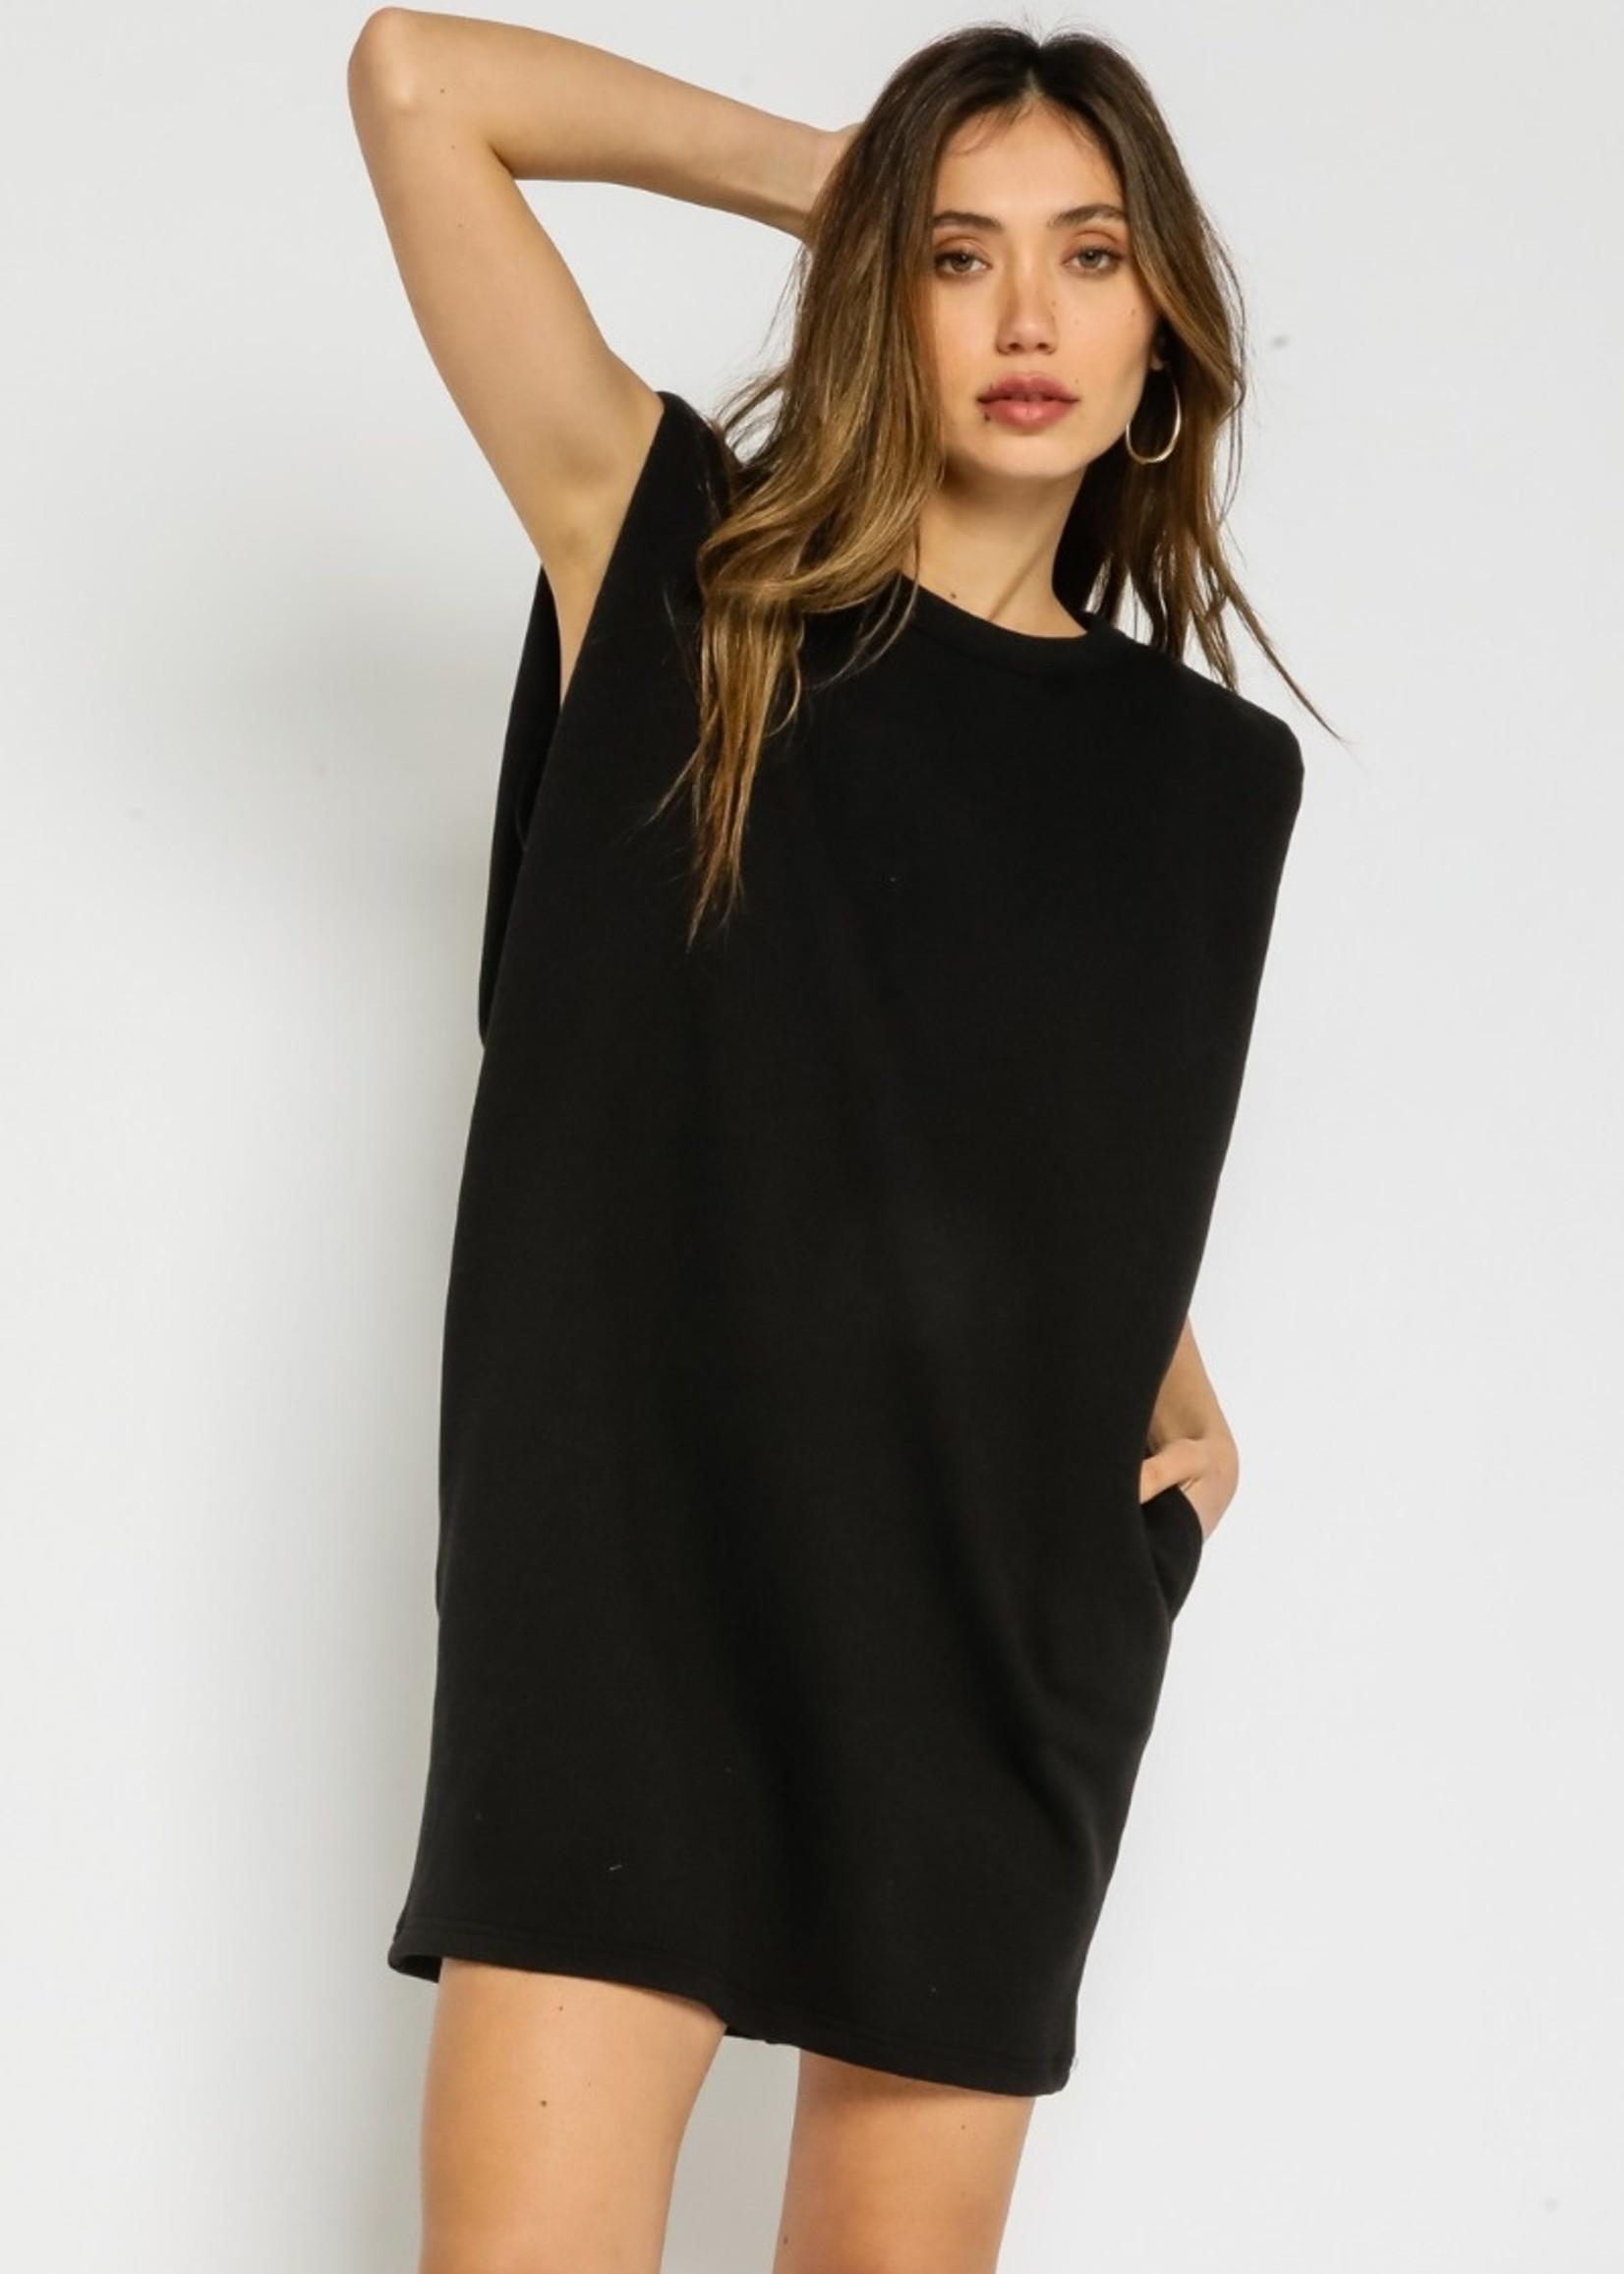 Muscle Sleeve Dress